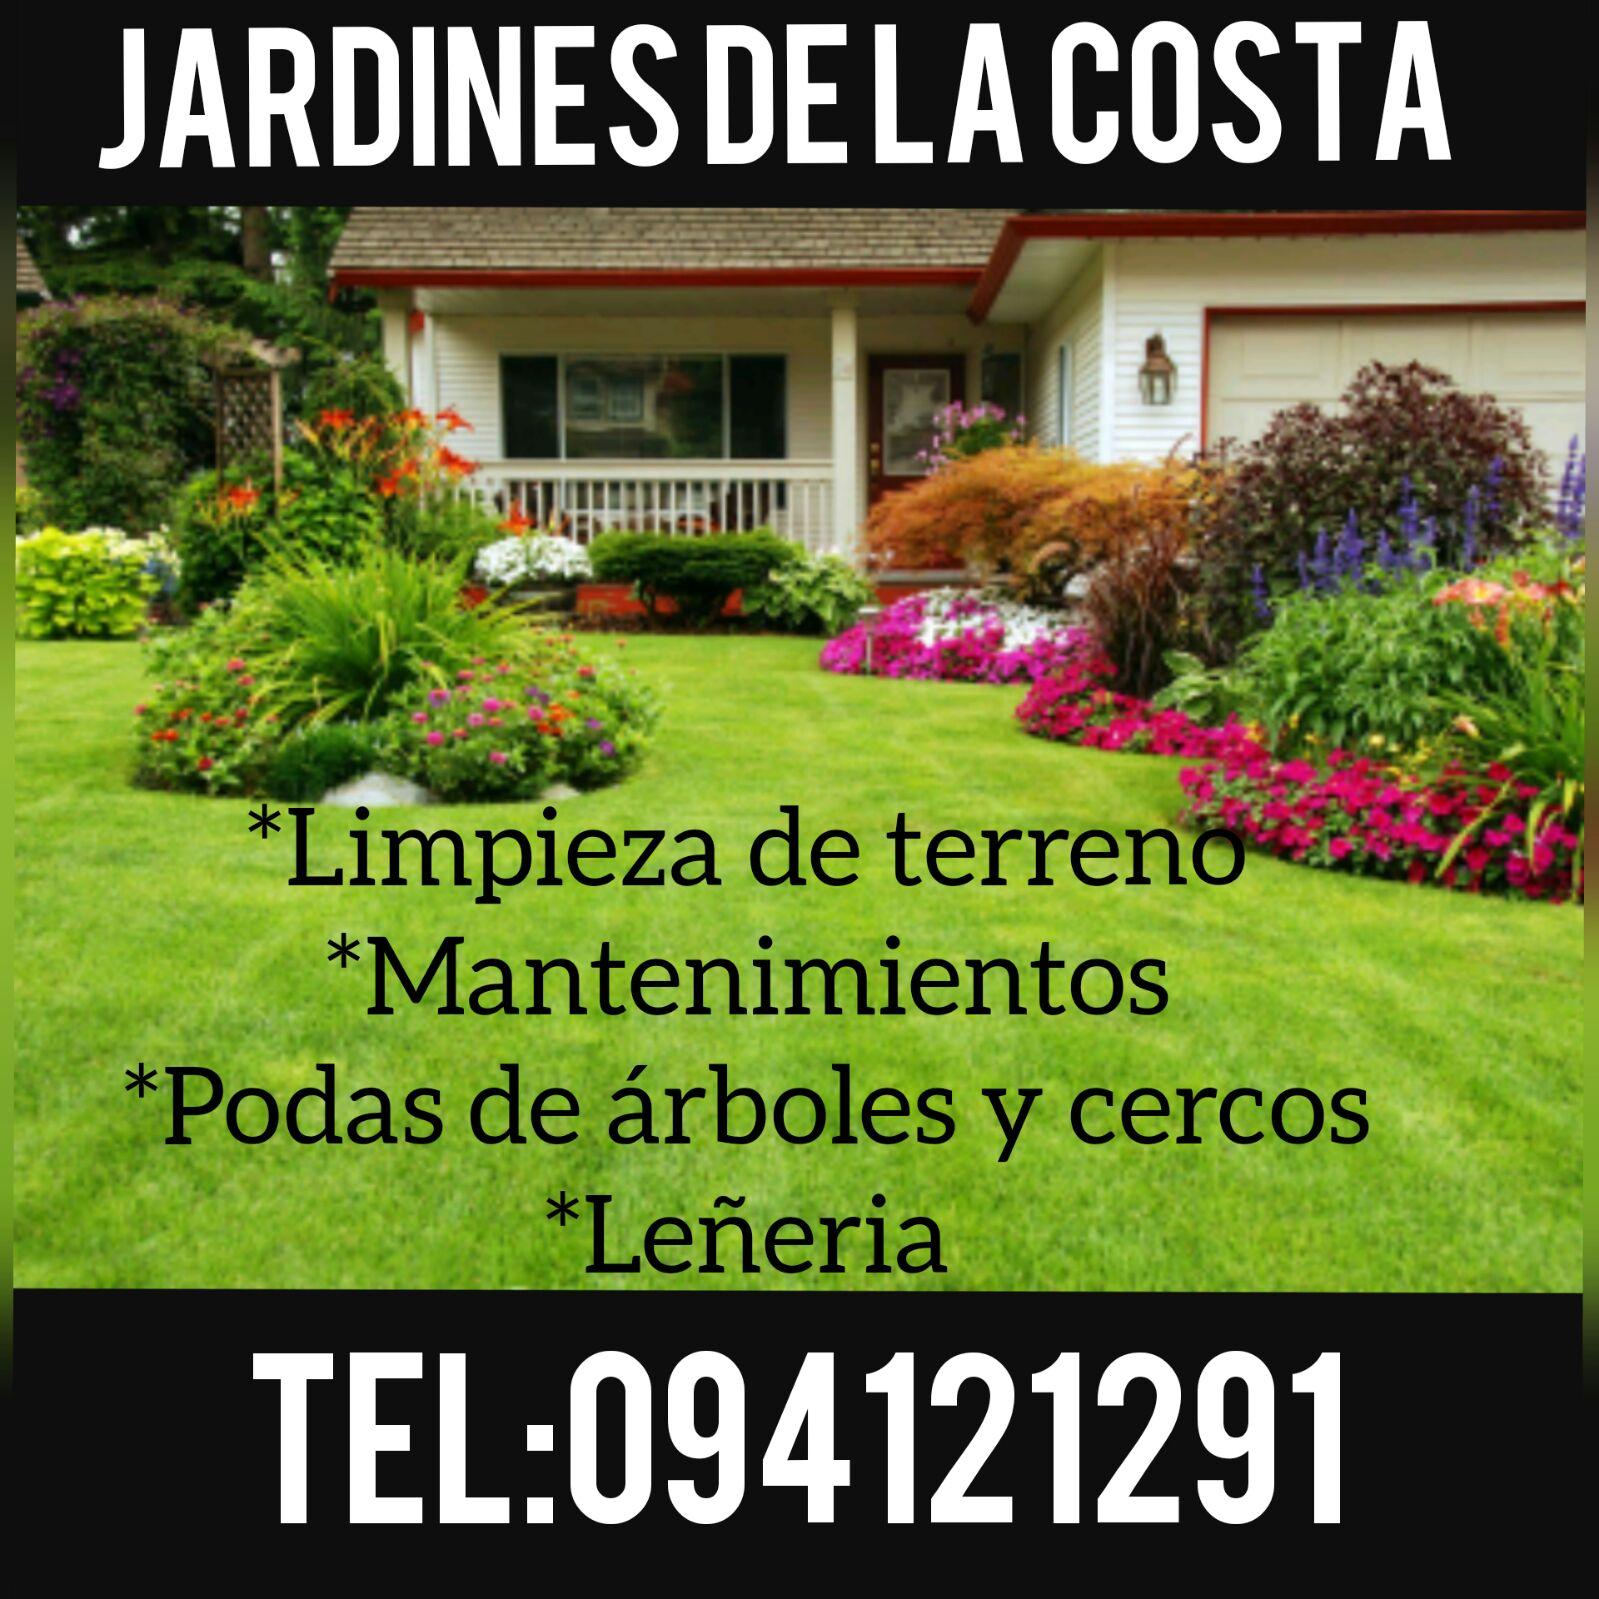 JARDINES DE LA COSTA